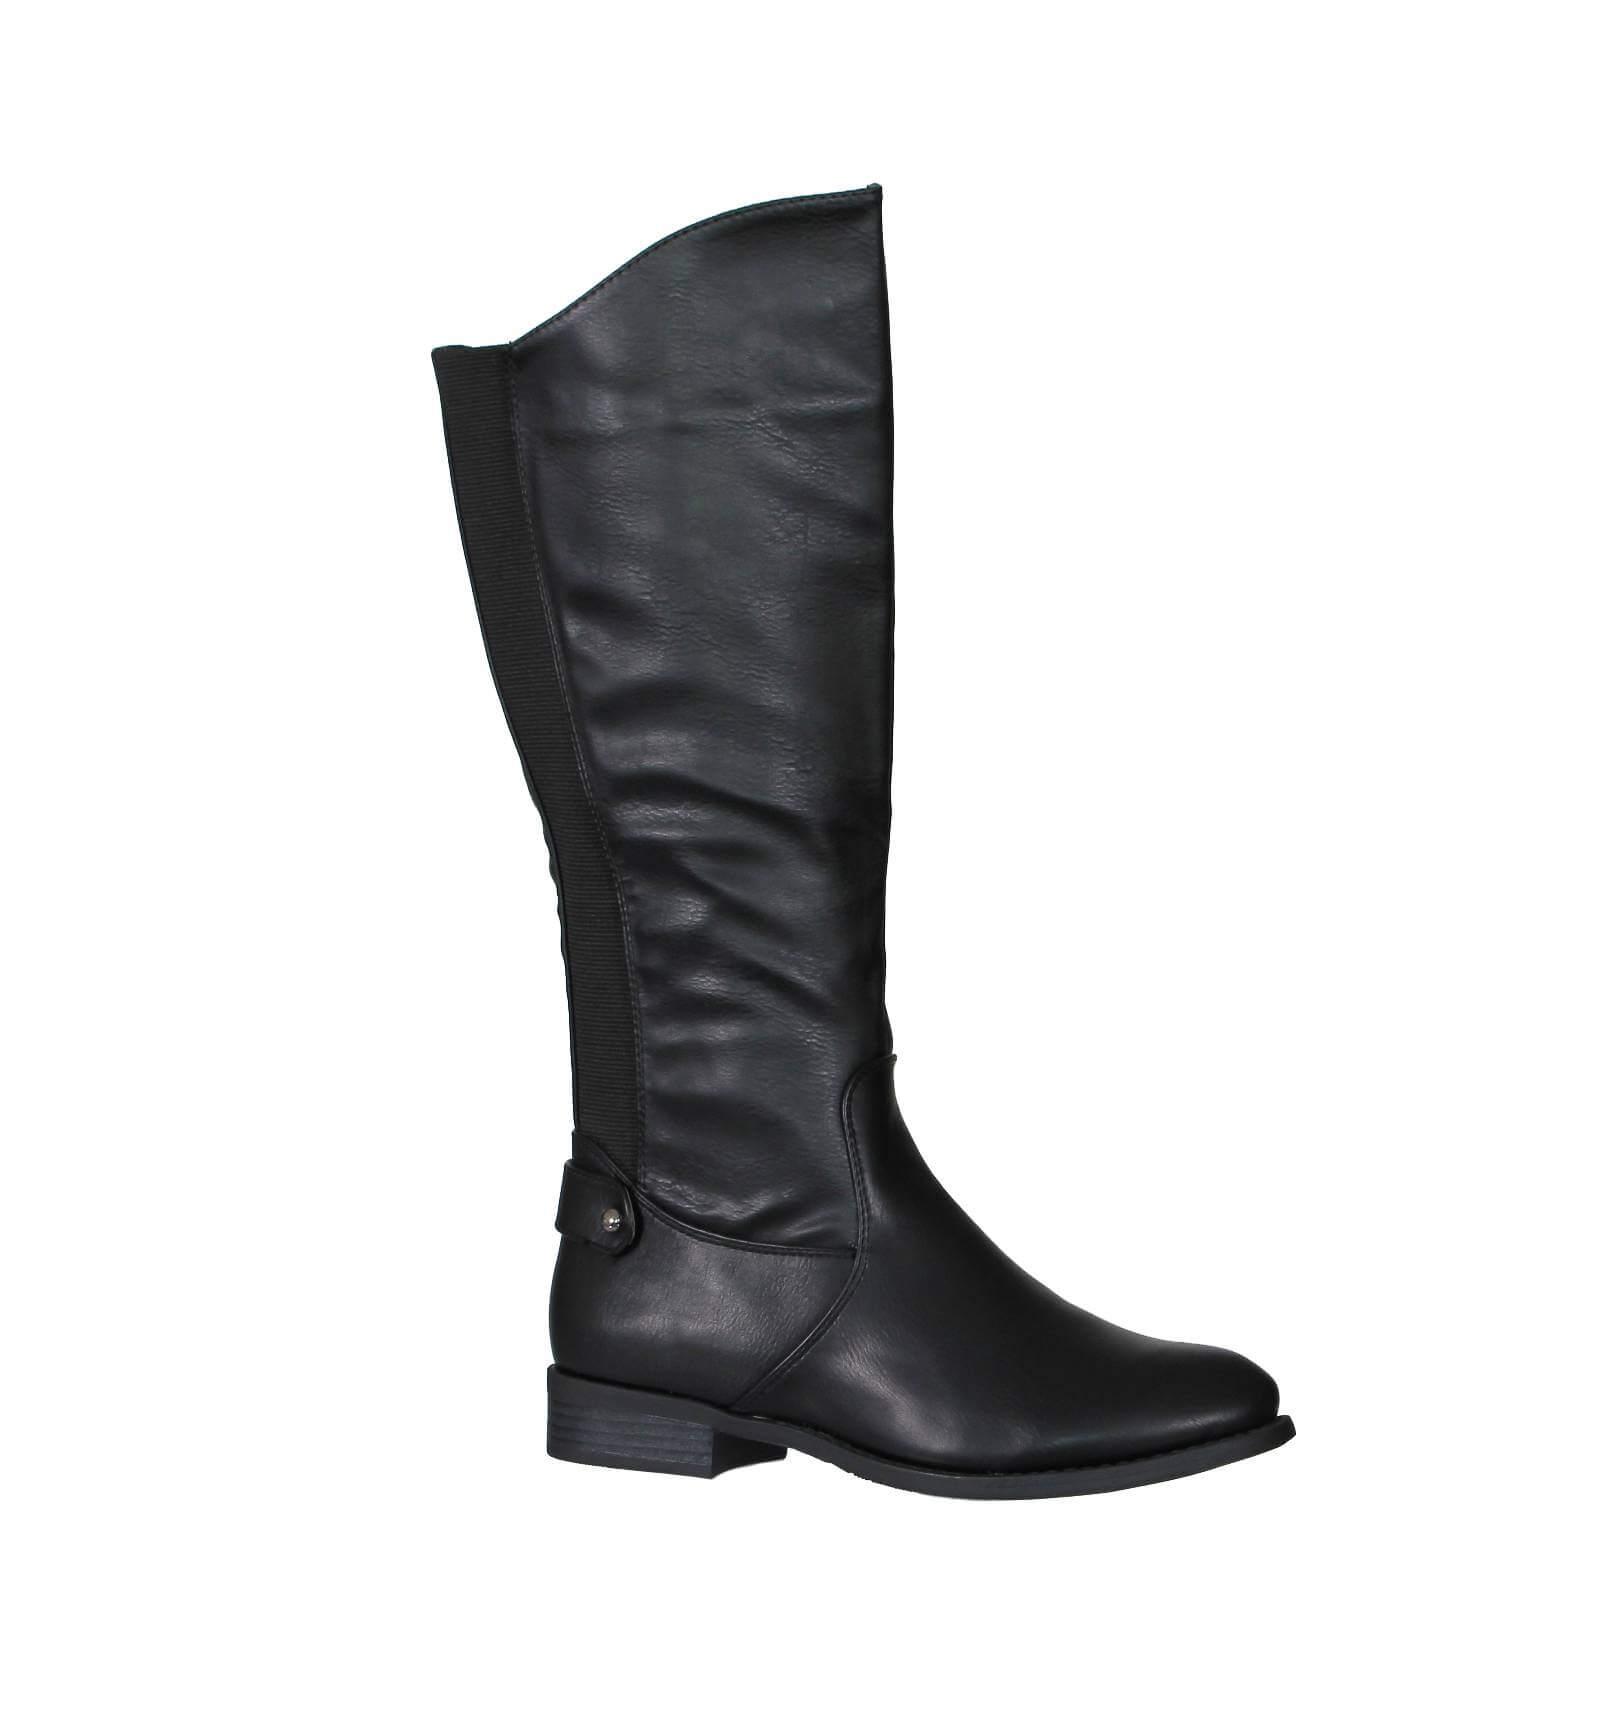 bottes femme cavali re simili cuir lastiqu e noir avec. Black Bedroom Furniture Sets. Home Design Ideas